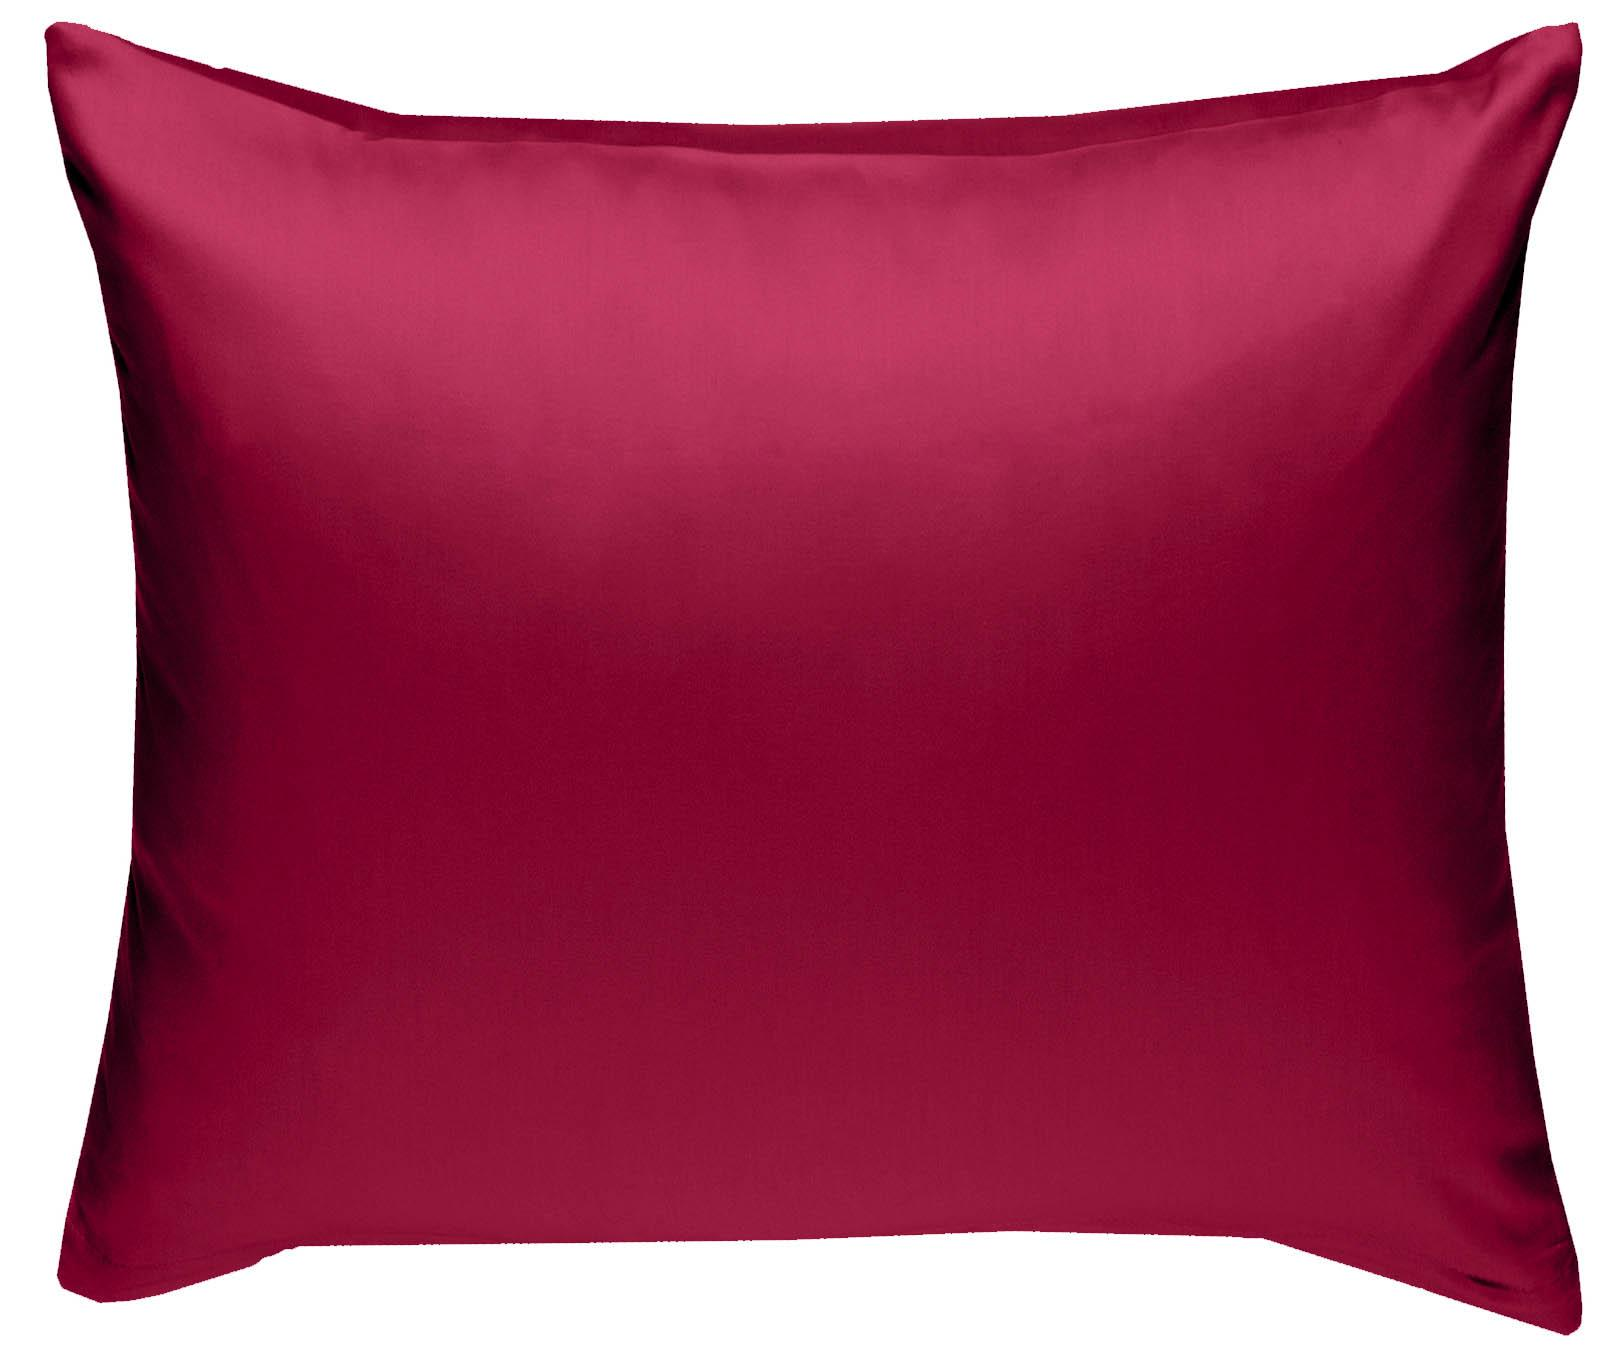 Mako Satin Kissenbezug uni pink 80x80 cm